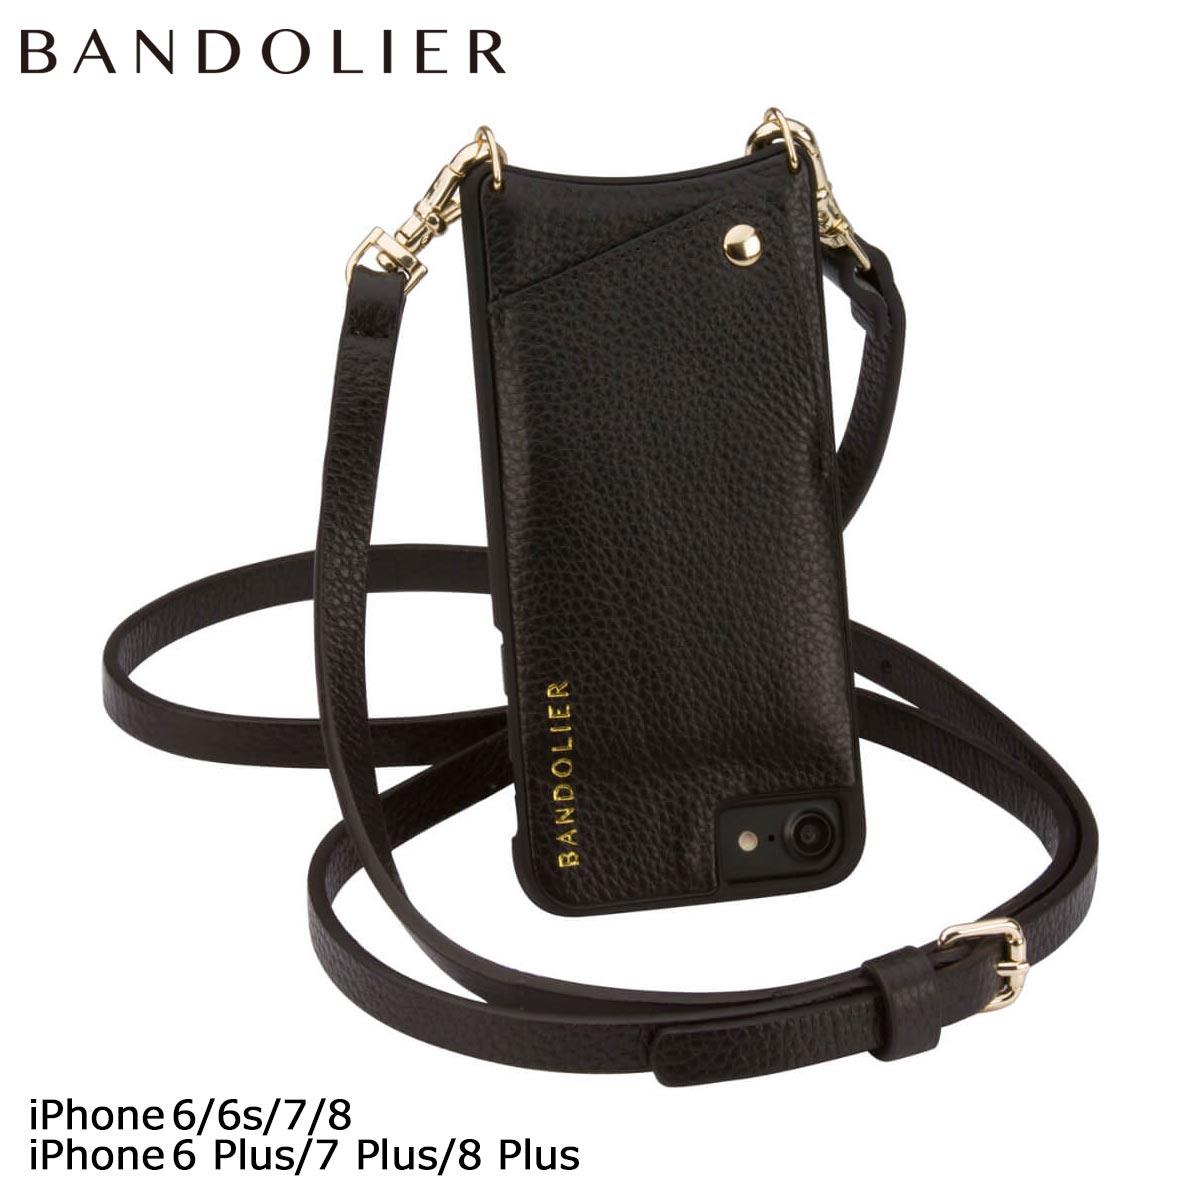 BANDOLIER iPhone8 iPhone7 7Plus 6s EMMA バンドリヤー ケース スマホ アイフォン プラス レザー メンズ レディース [予約商品 4月下旬頃入荷予定 再入荷]